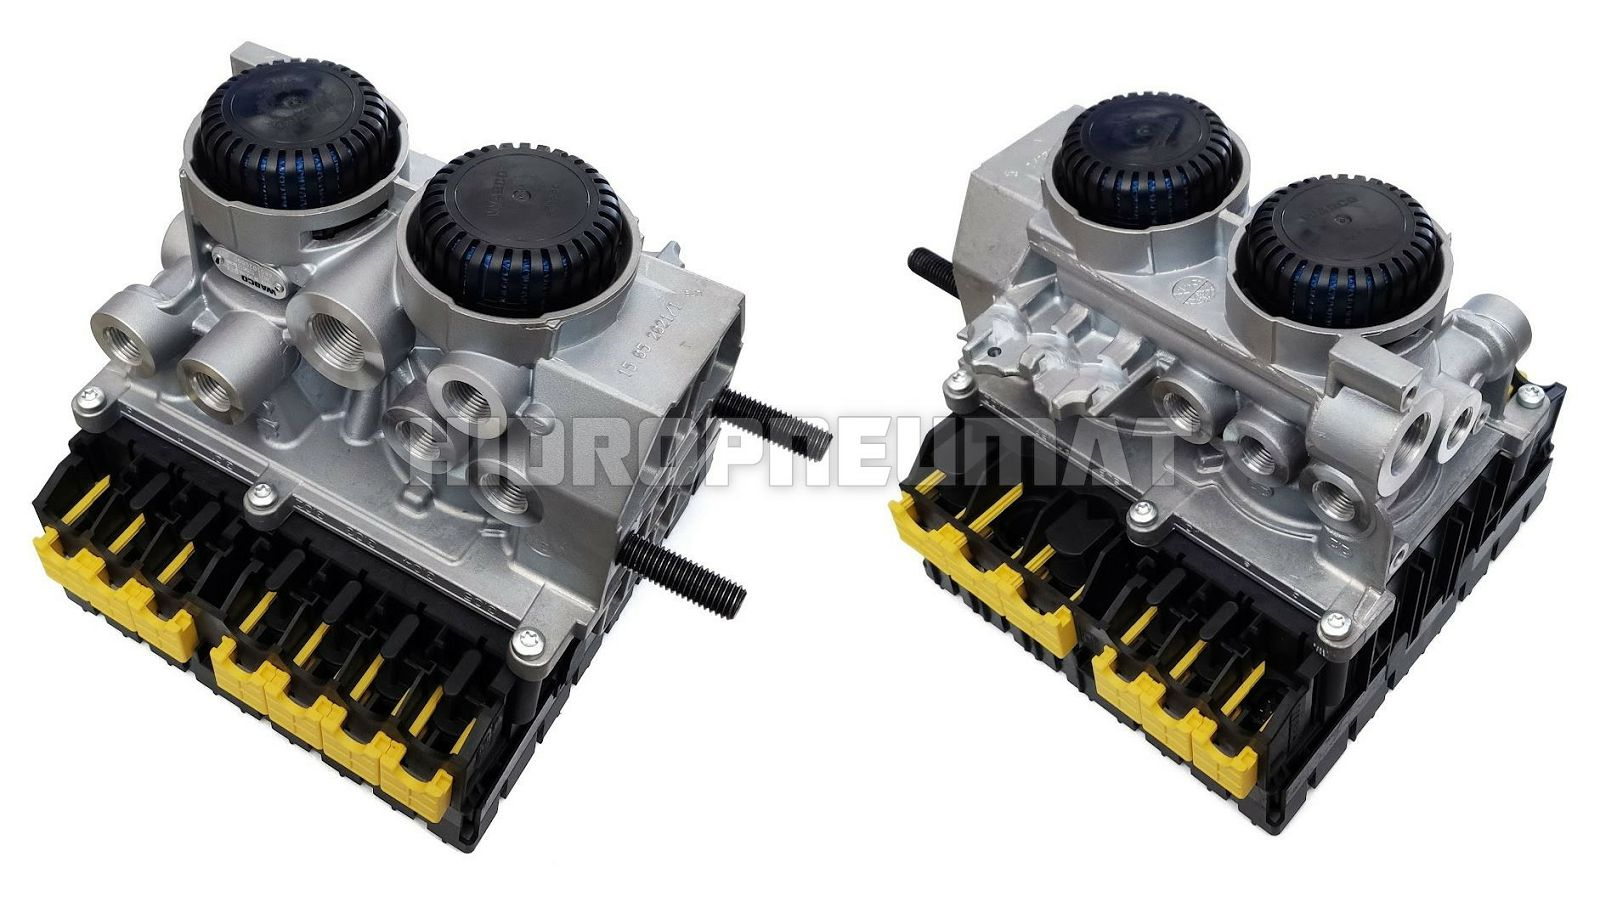 modulator-premium-24v-ebs-e-gen-4s3m-wabco-bez-pem--125489_1.jpg